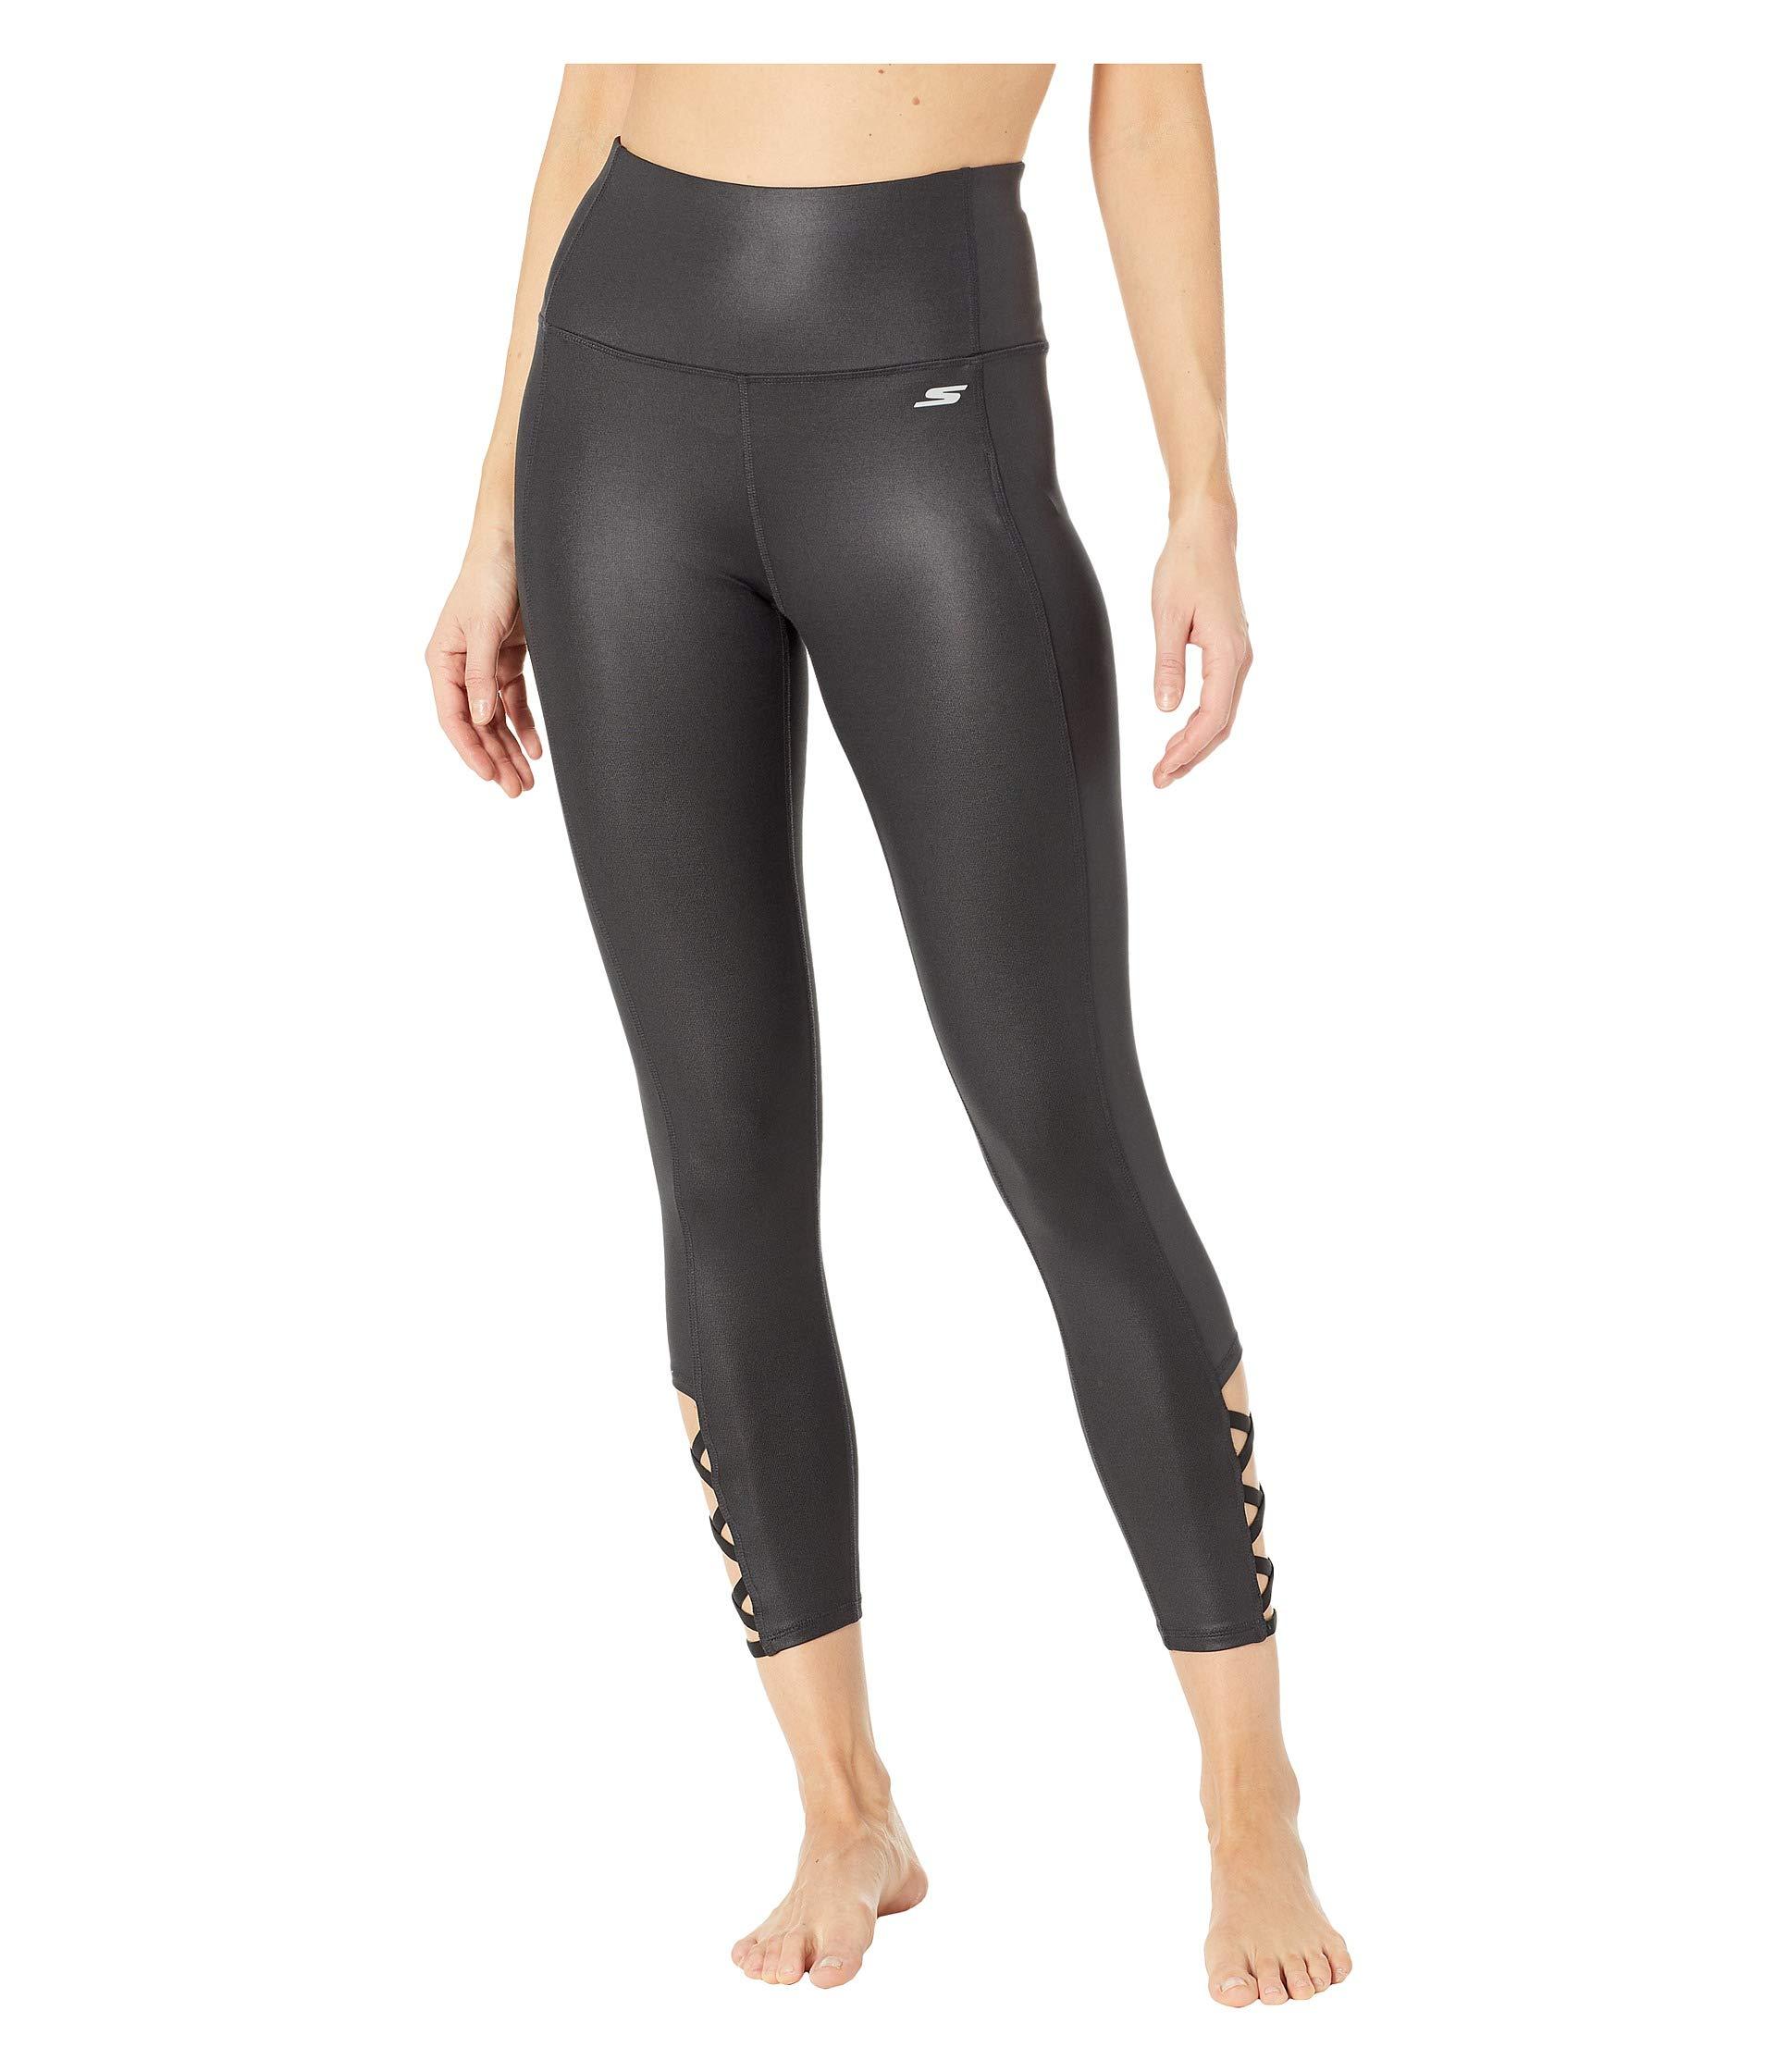 Black Black Shine Skechers Skechers Skechers Black Shine Leggings Immersion Skechers Leggings Immersion Immersion Shine Leggings qqIFz